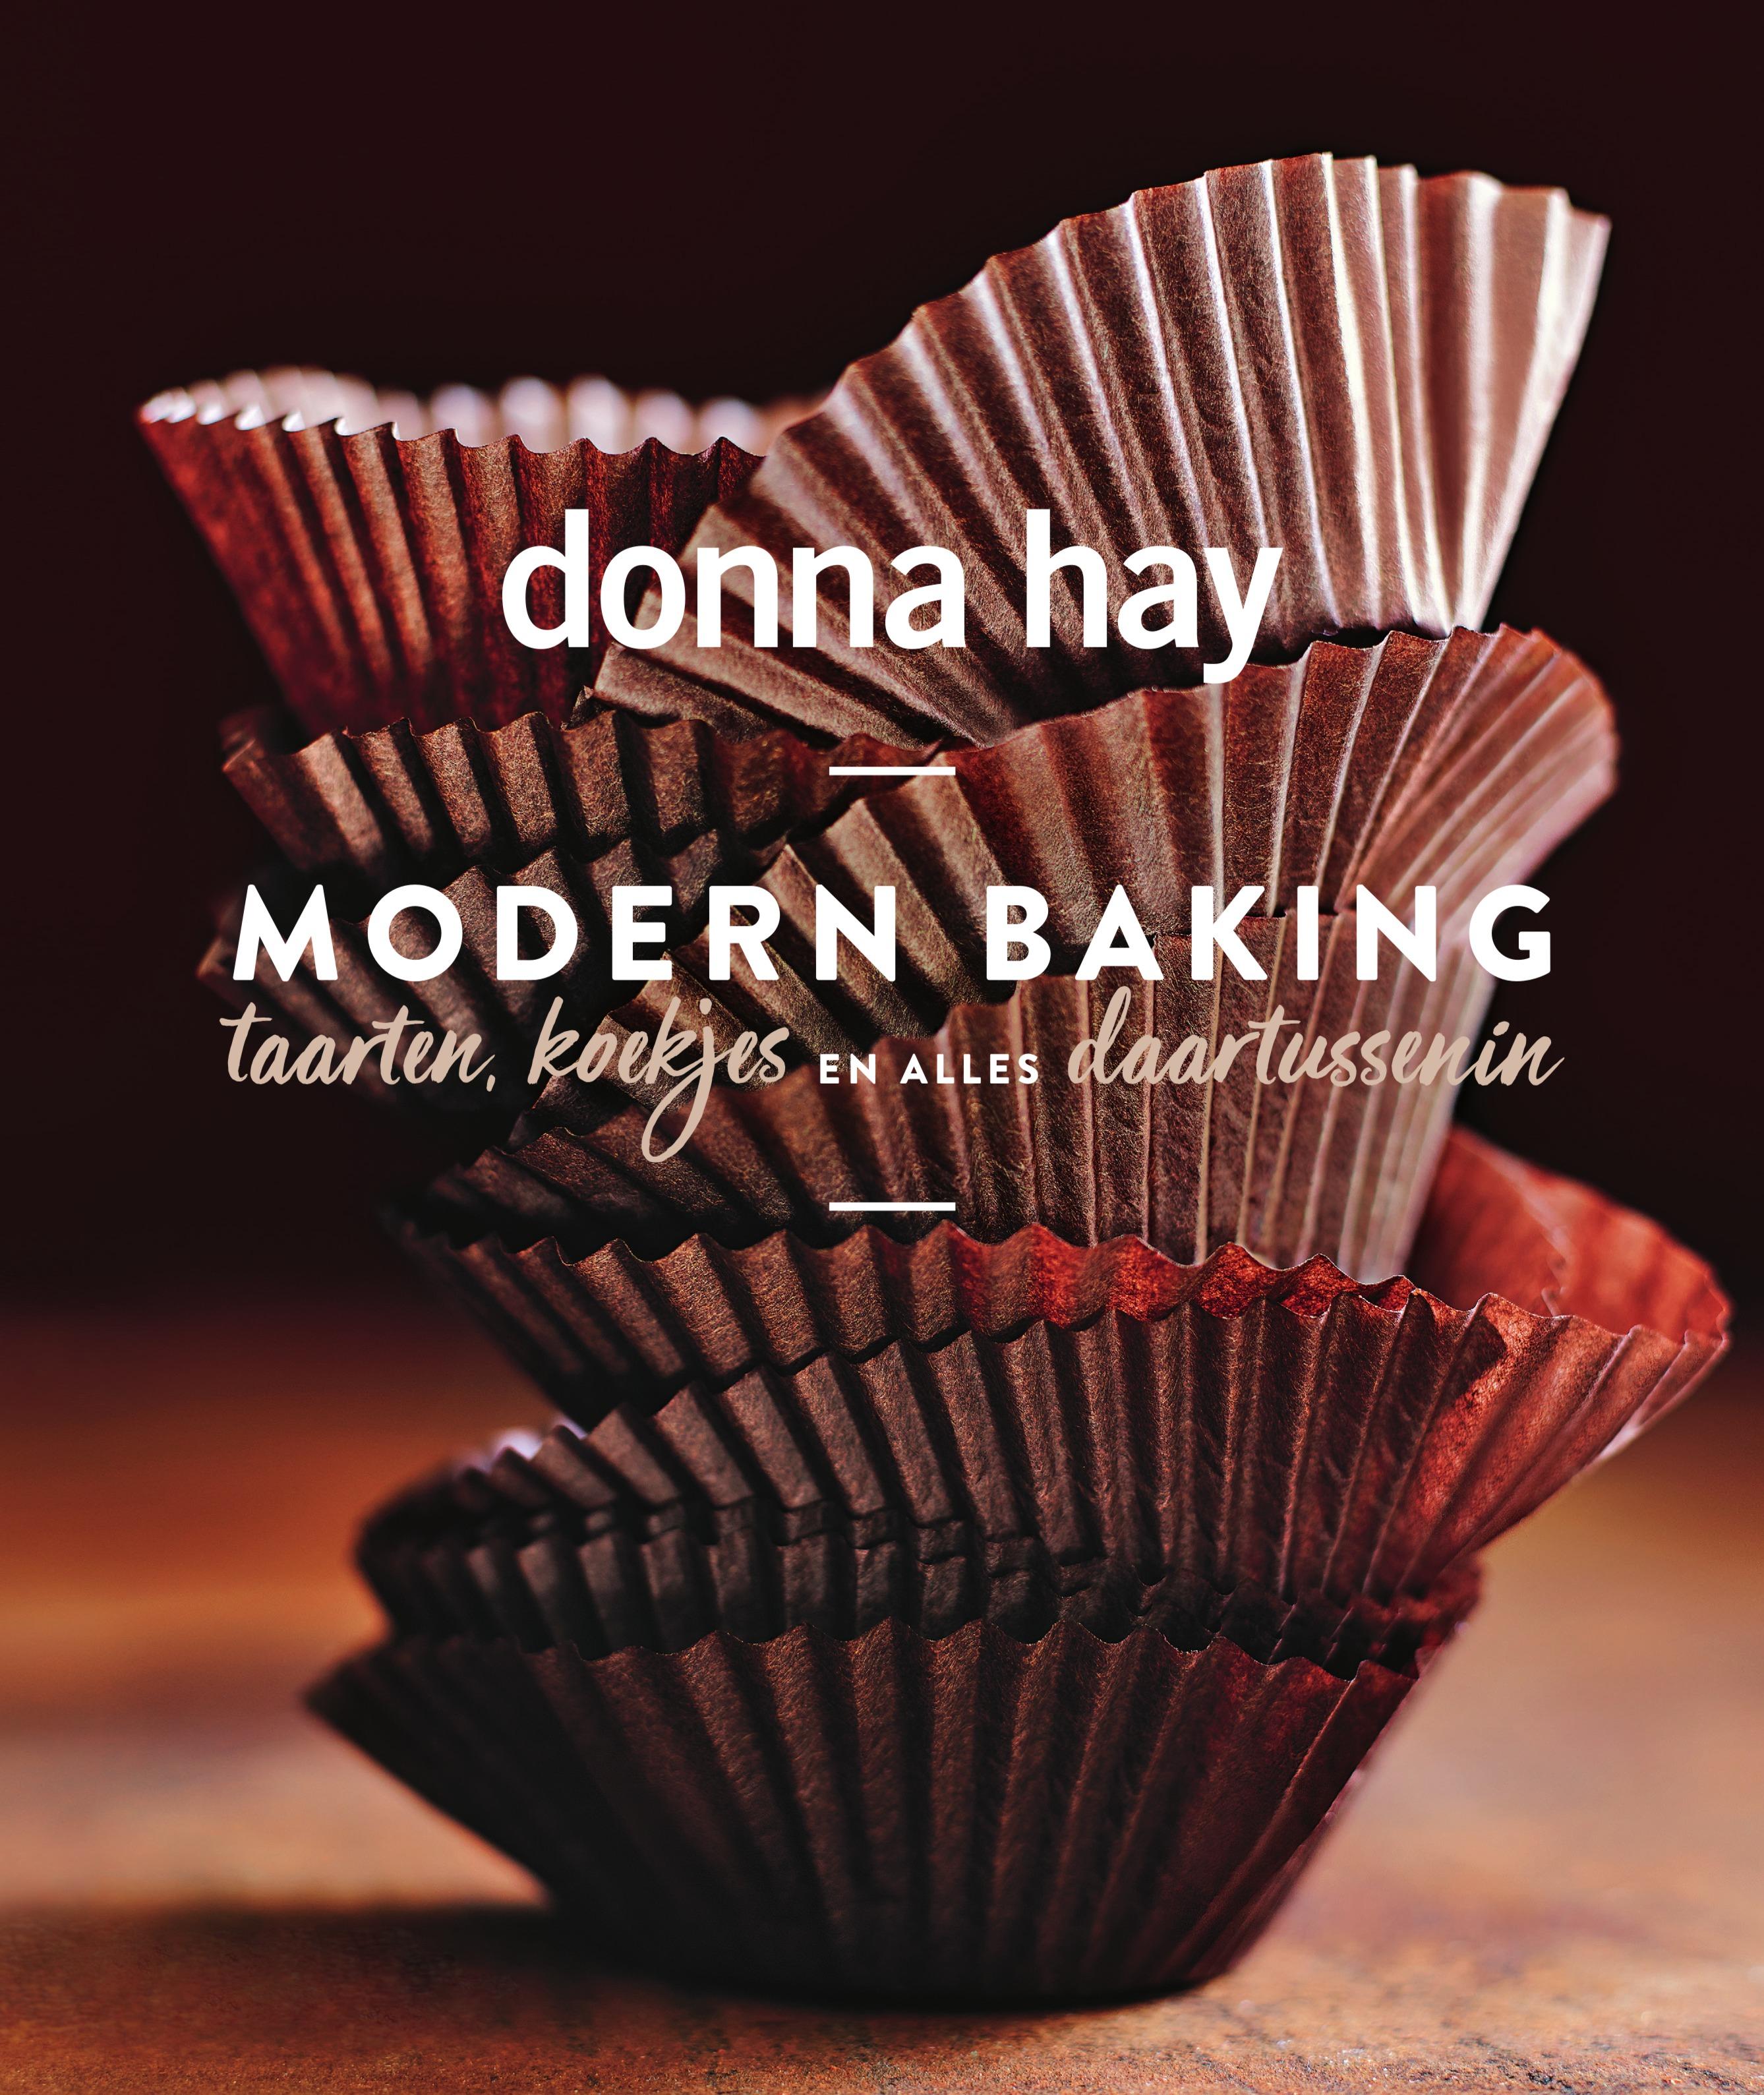 Modern Baking - amandelcakejes